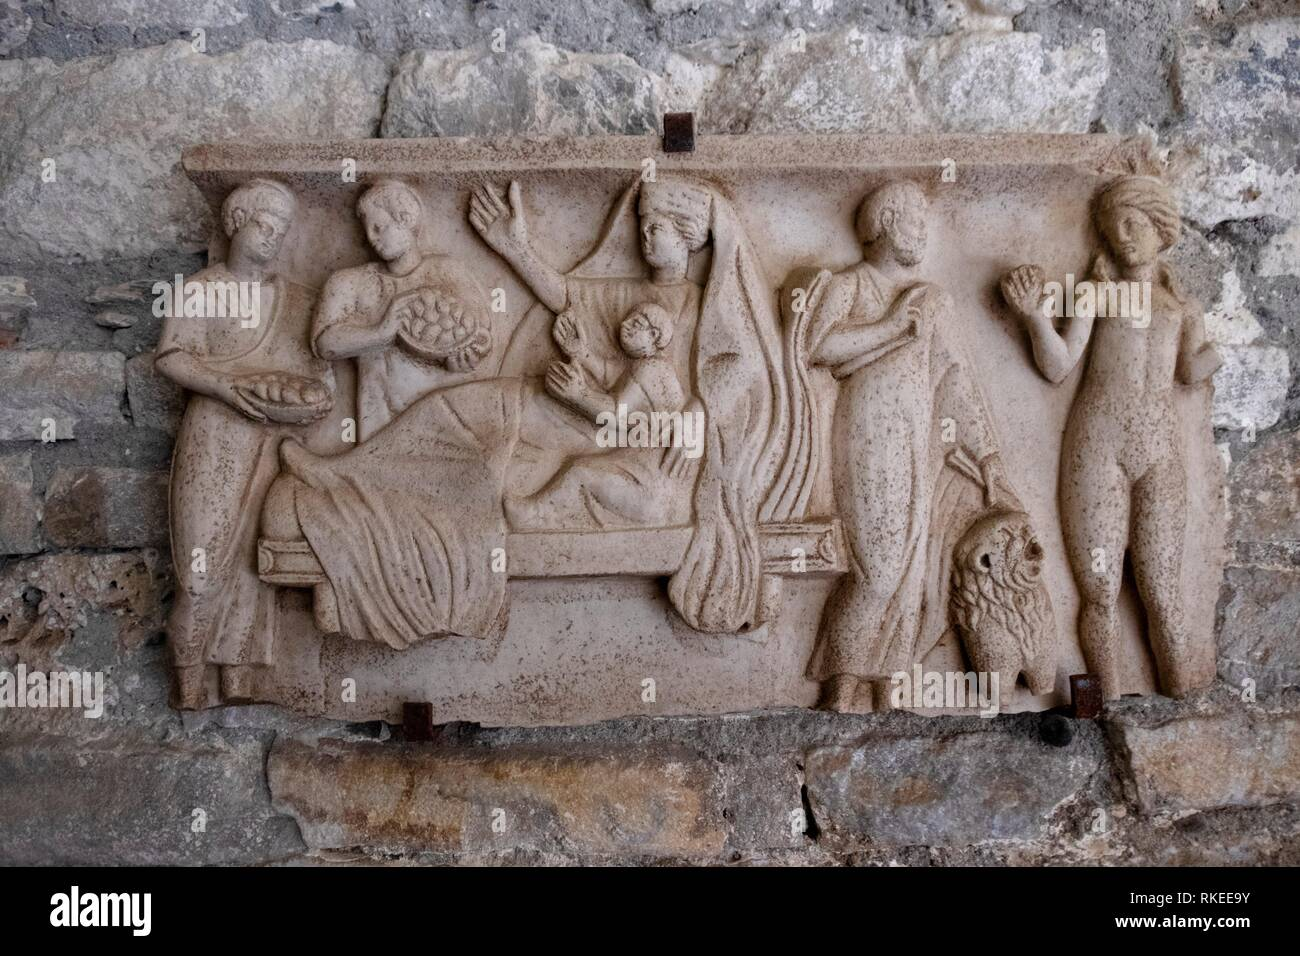 Frankreich. Royal, Haute Garonne, Goll, römische Platte (5. Jahrhundert) an der Basilika Saint Just dee Valmirande. Stockbild